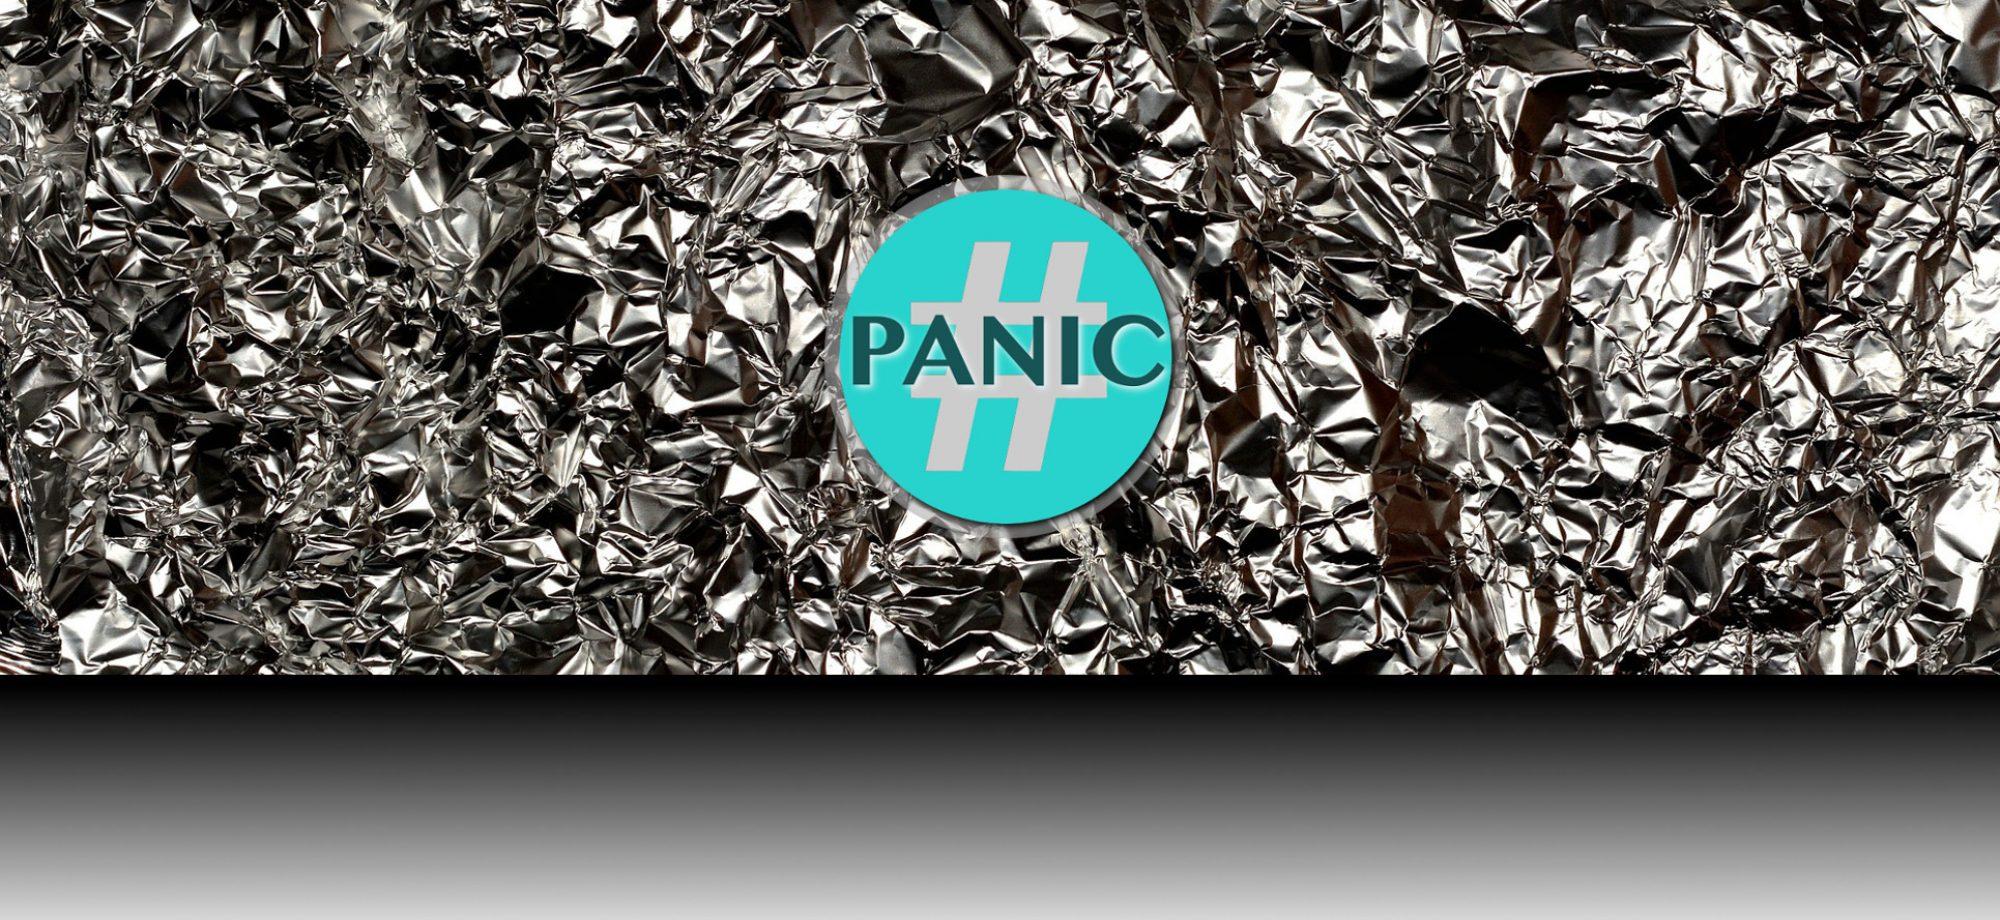 #PANIC